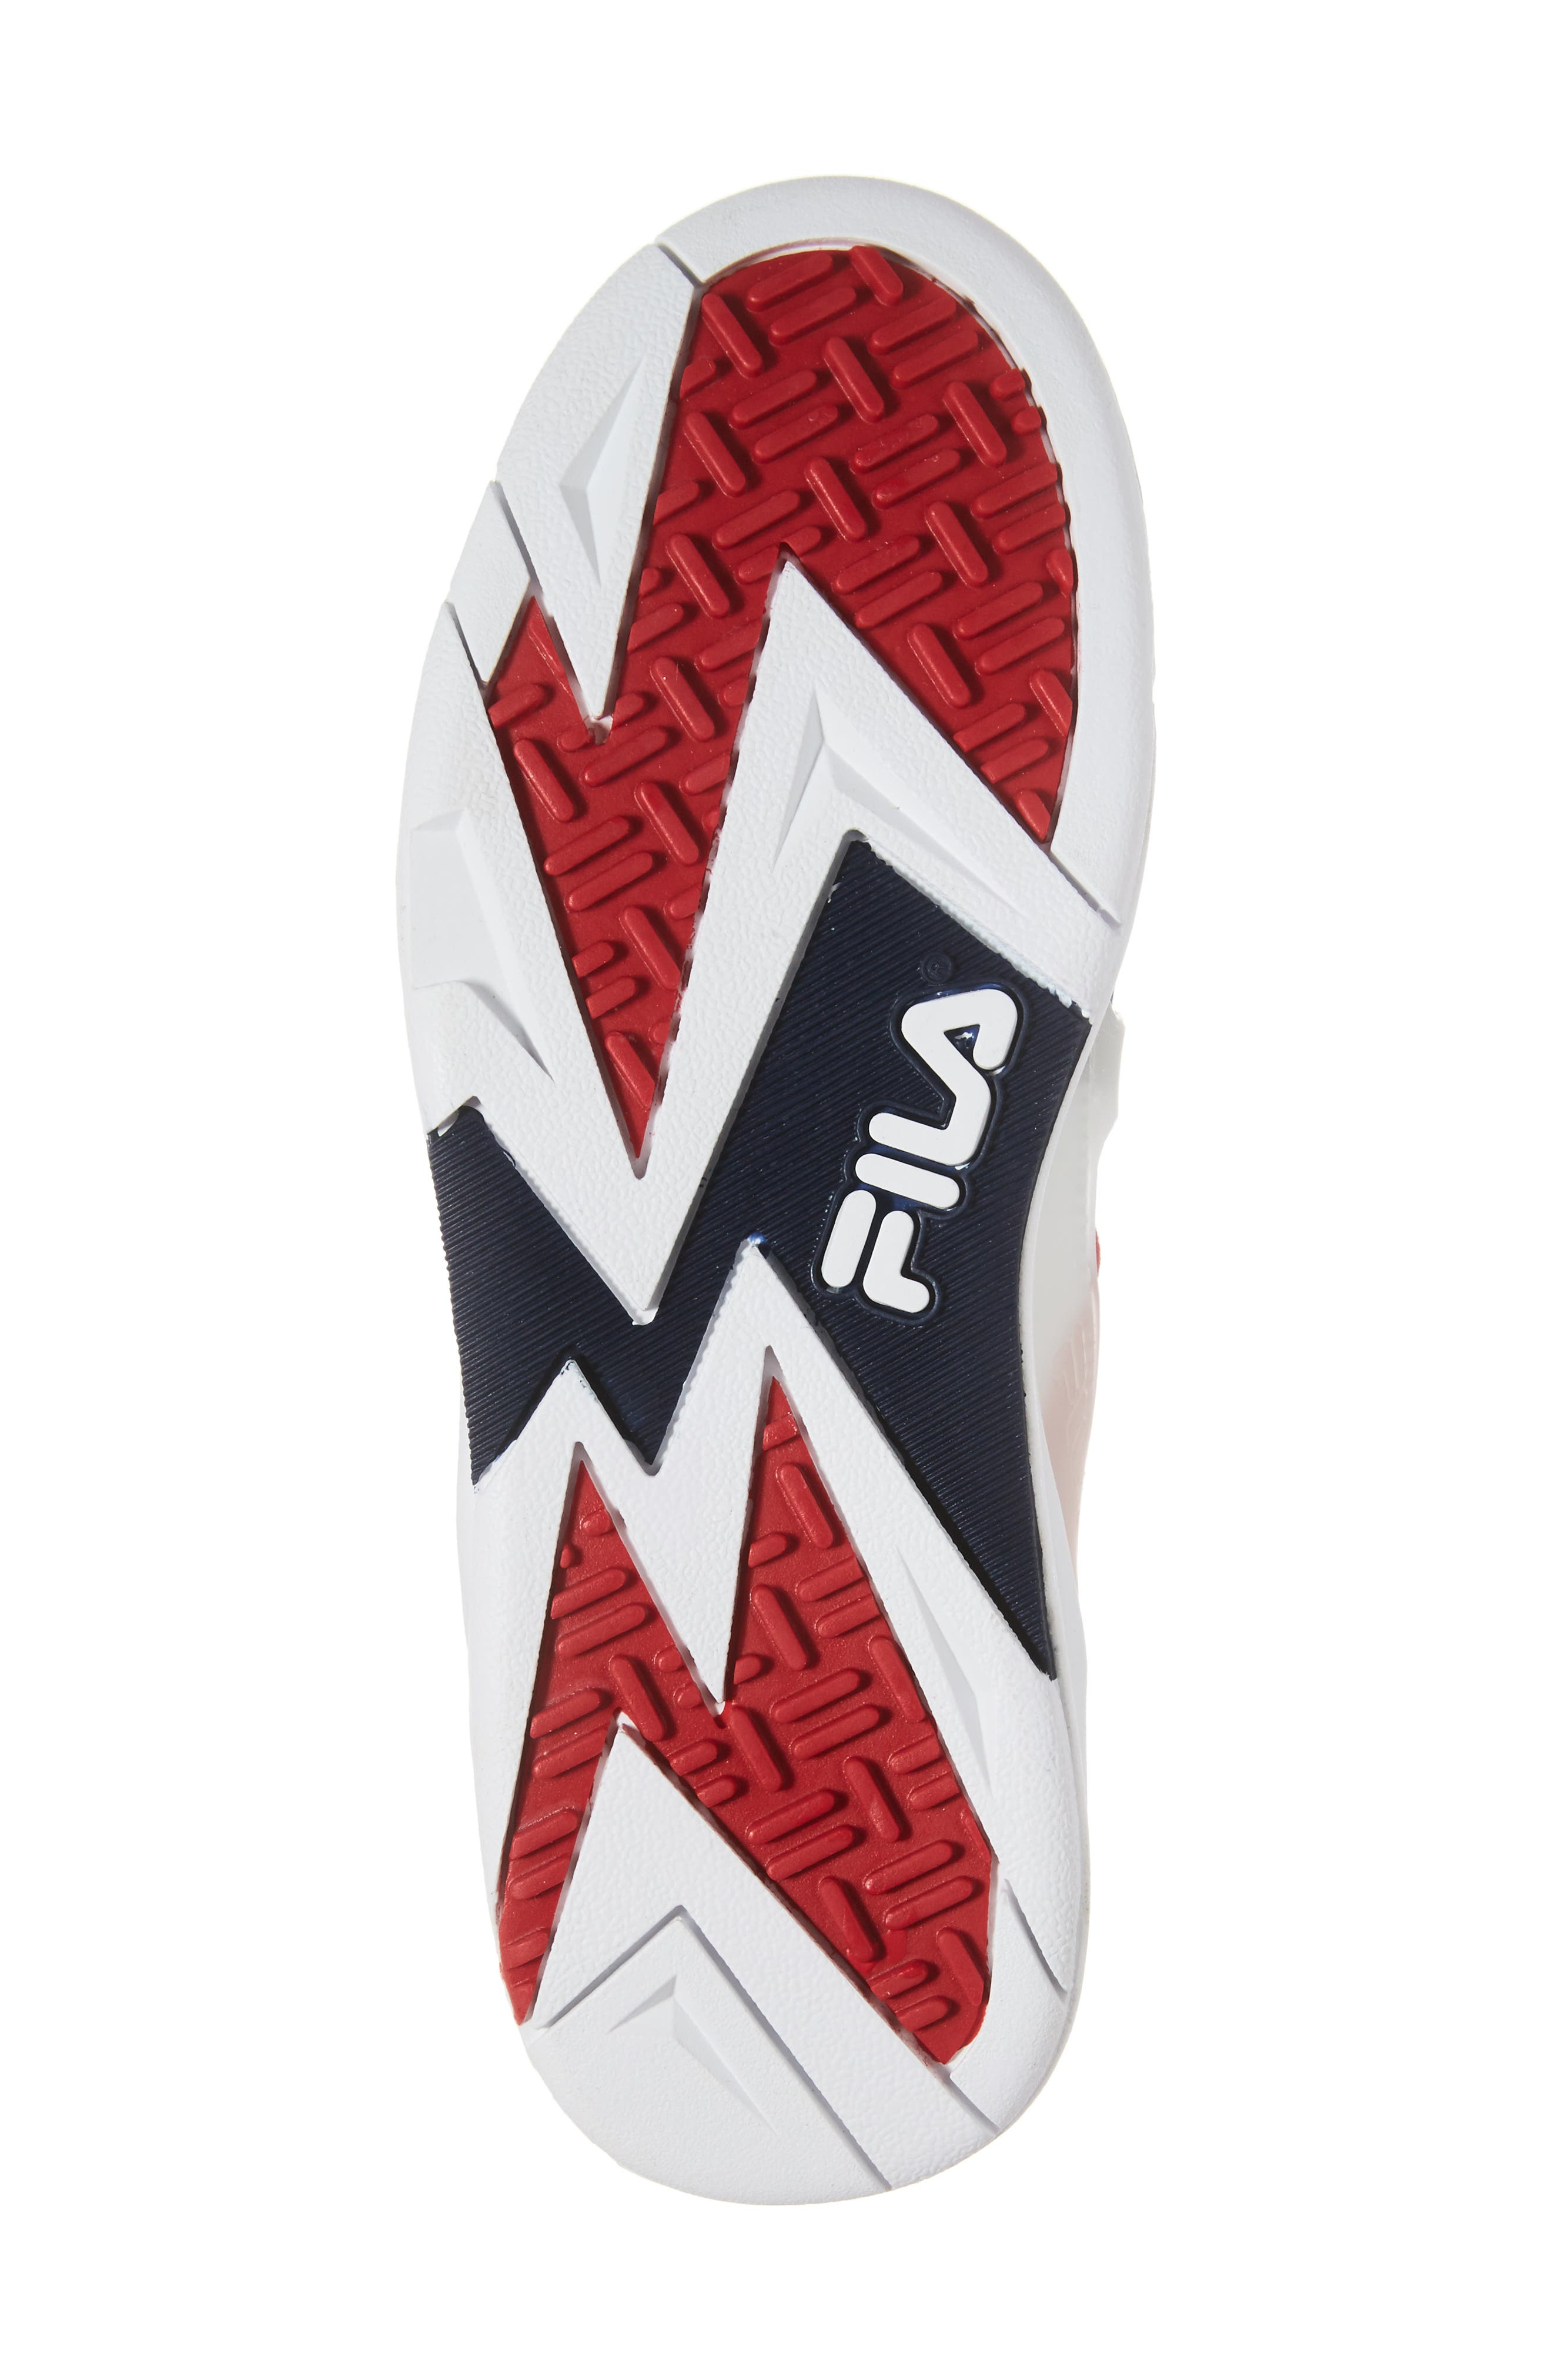 FILA, Cage 17 Logo High Top Sneaker, Alternate thumbnail 6, color, 125